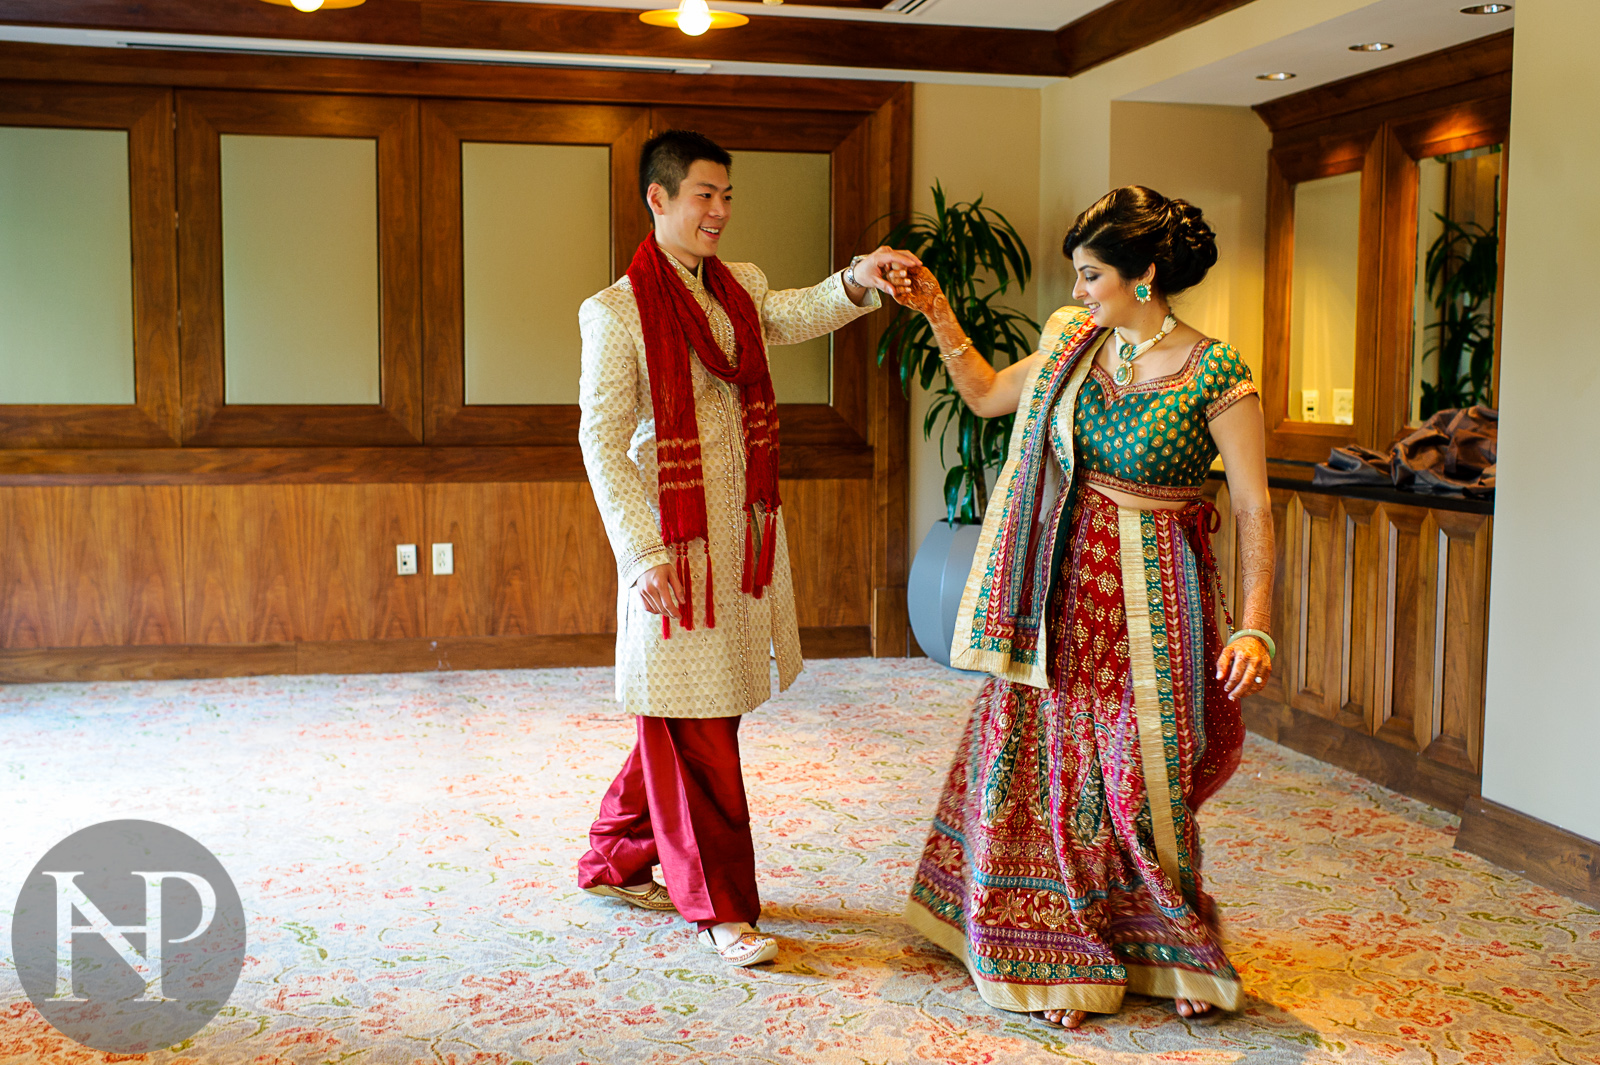 washington dc music photographer noah hayes georgetown dc va md alexandria - madarin hotel - oriental - indian - chinese - naina christopher.jpg-26.jpg